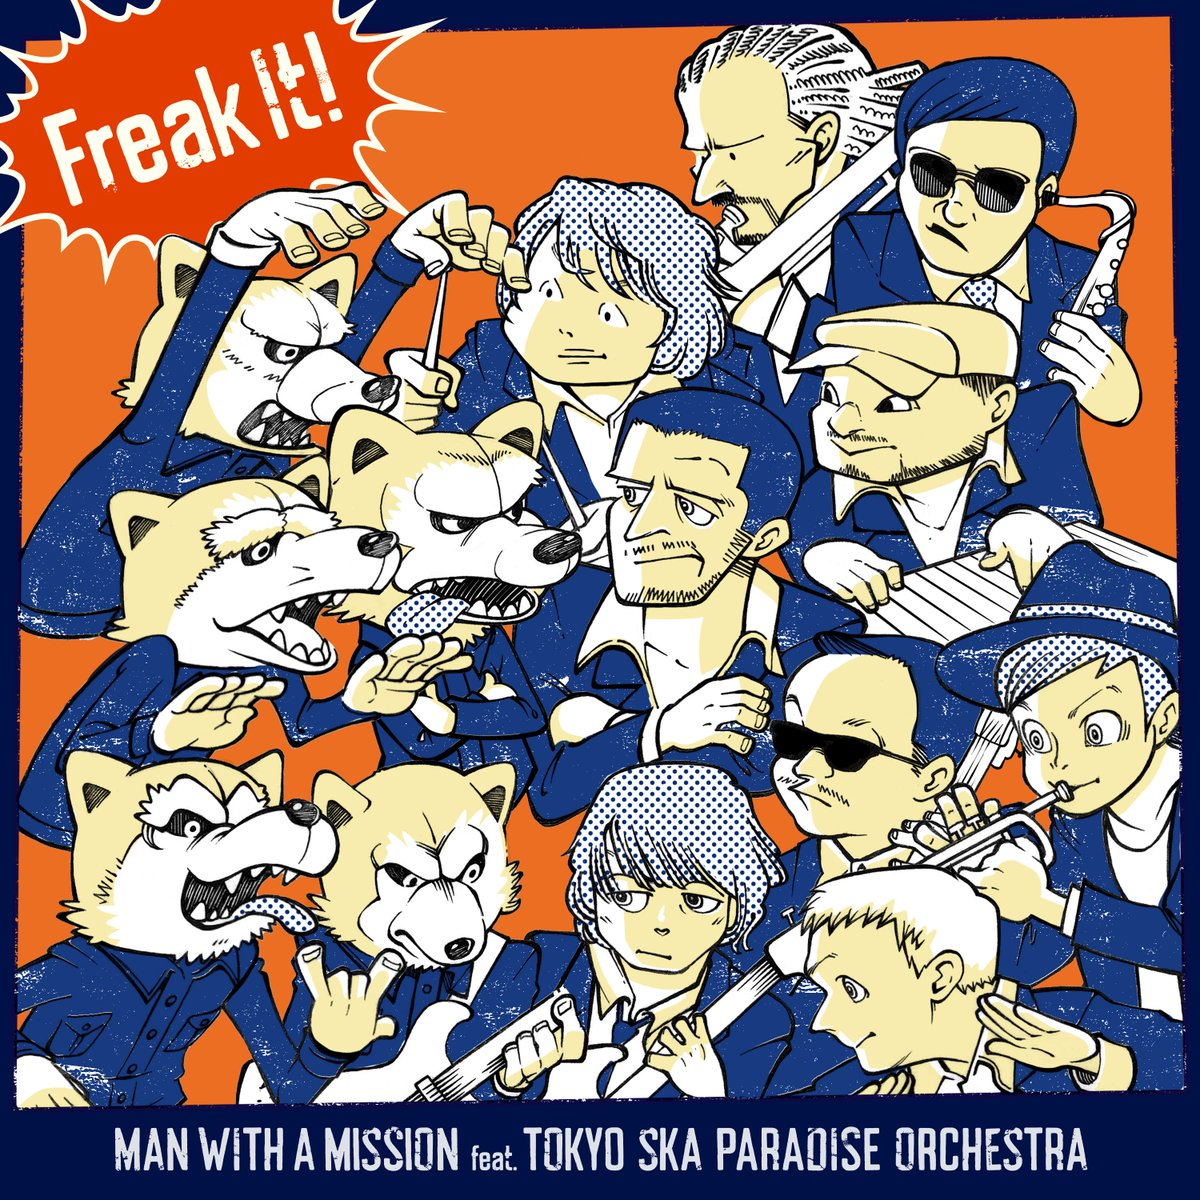 「Freak It! feat.東京スカパラダイスオーケストラ」のジャケ写大公開! mwamjapan.info/contents/145017